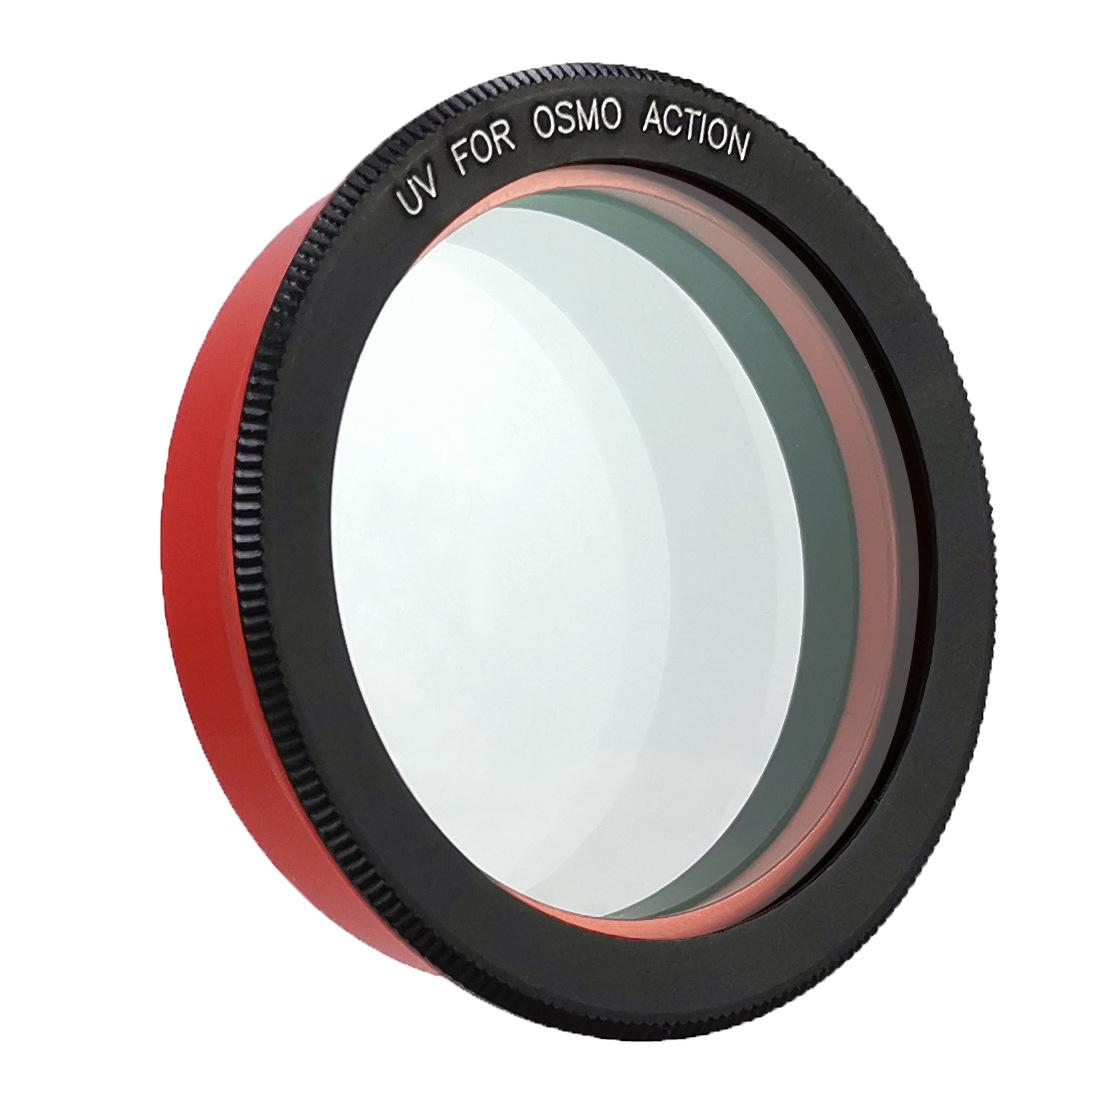 Camera Lens Filter for DJI Osmo Action Cameras UV CPL Lens High Light Transmittance Low Reflectance UV lens filter